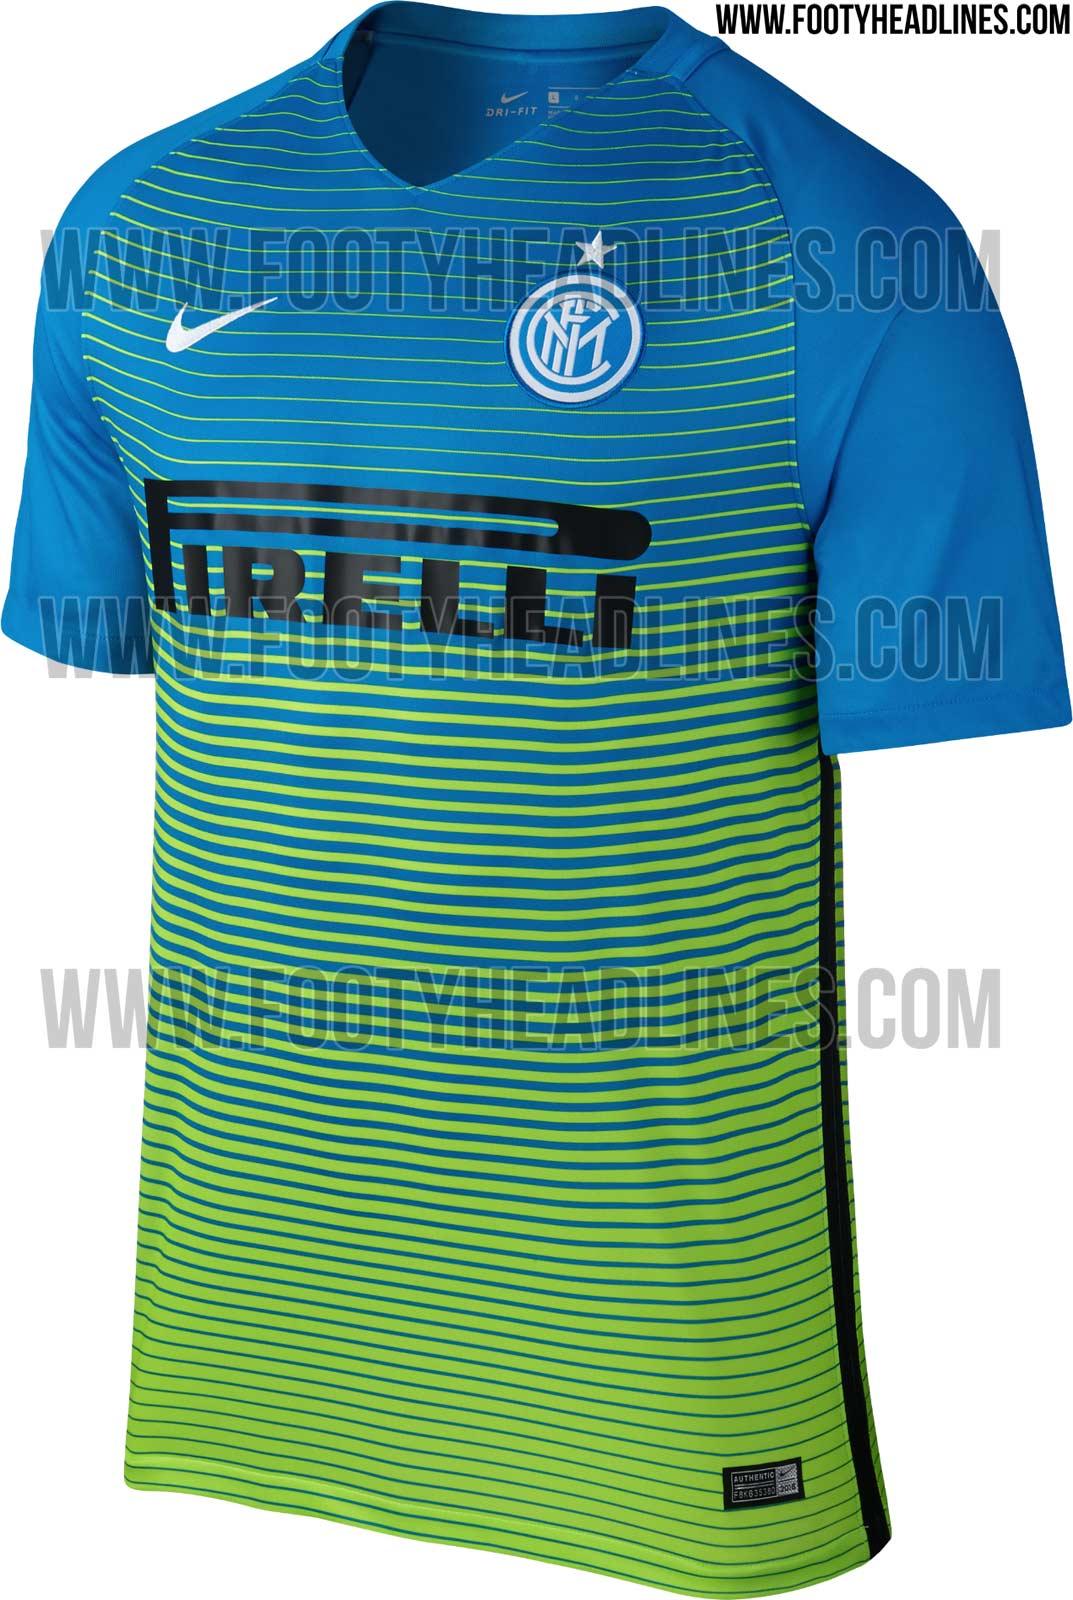 Buy Nike 2016-17 Third Kits Leaked d6591d56c